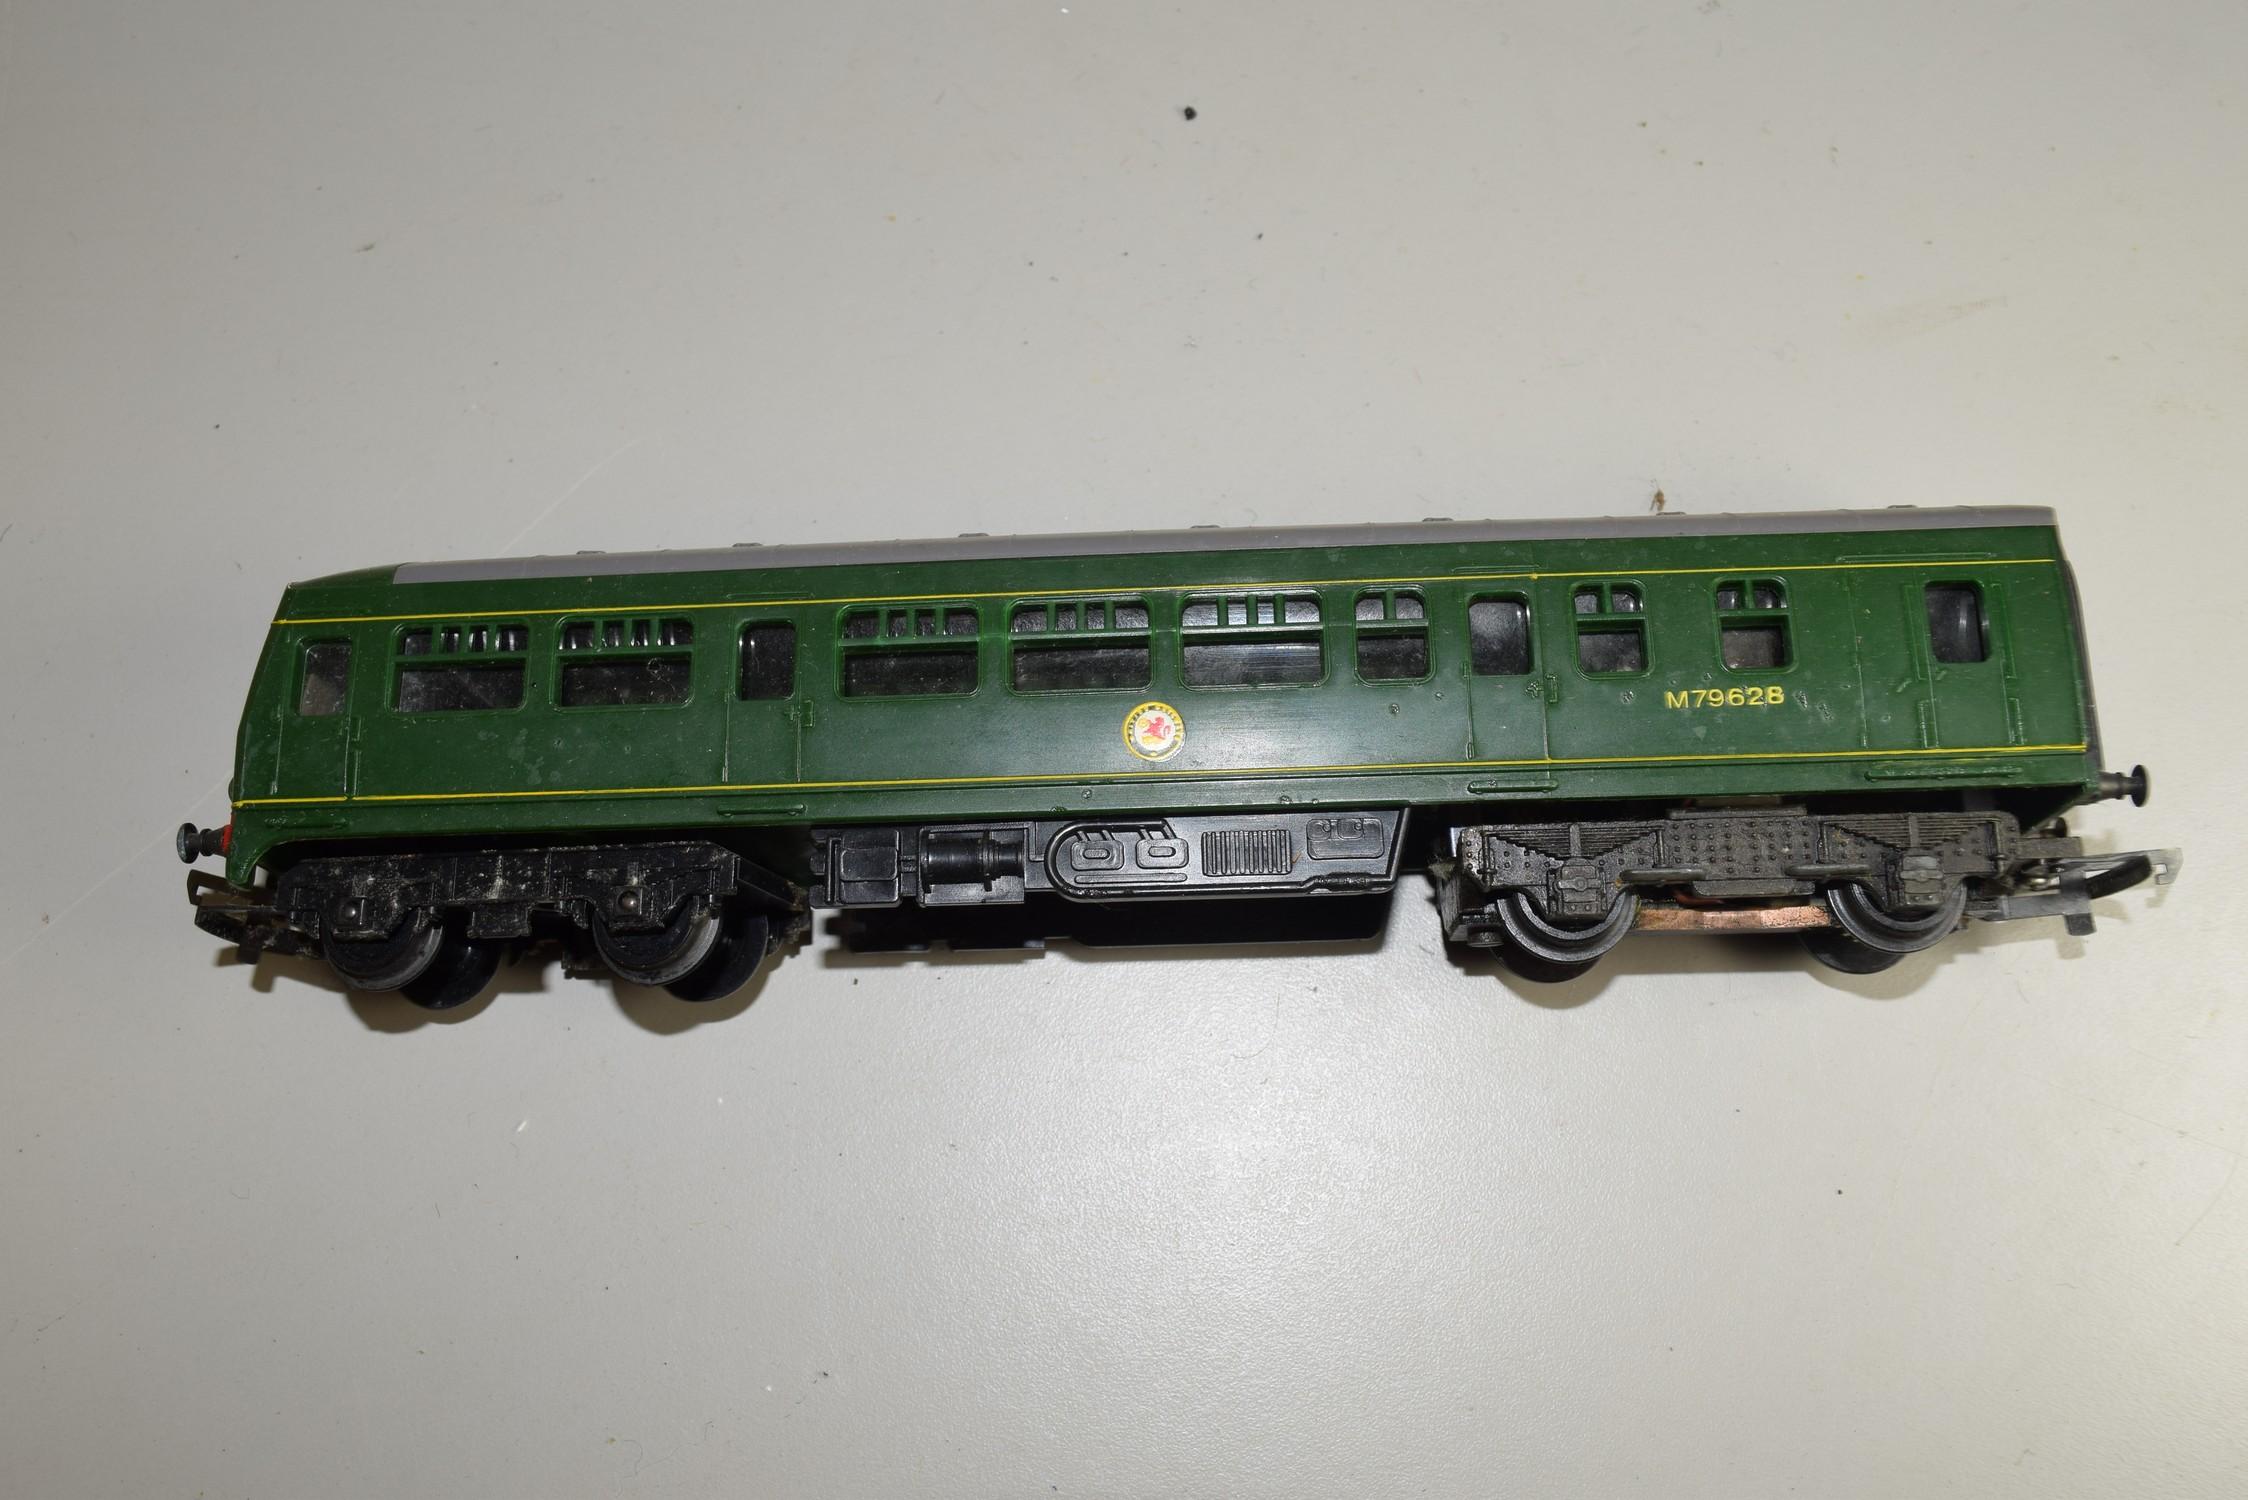 Unboxed 00 gauge Triang locomotive no M79628